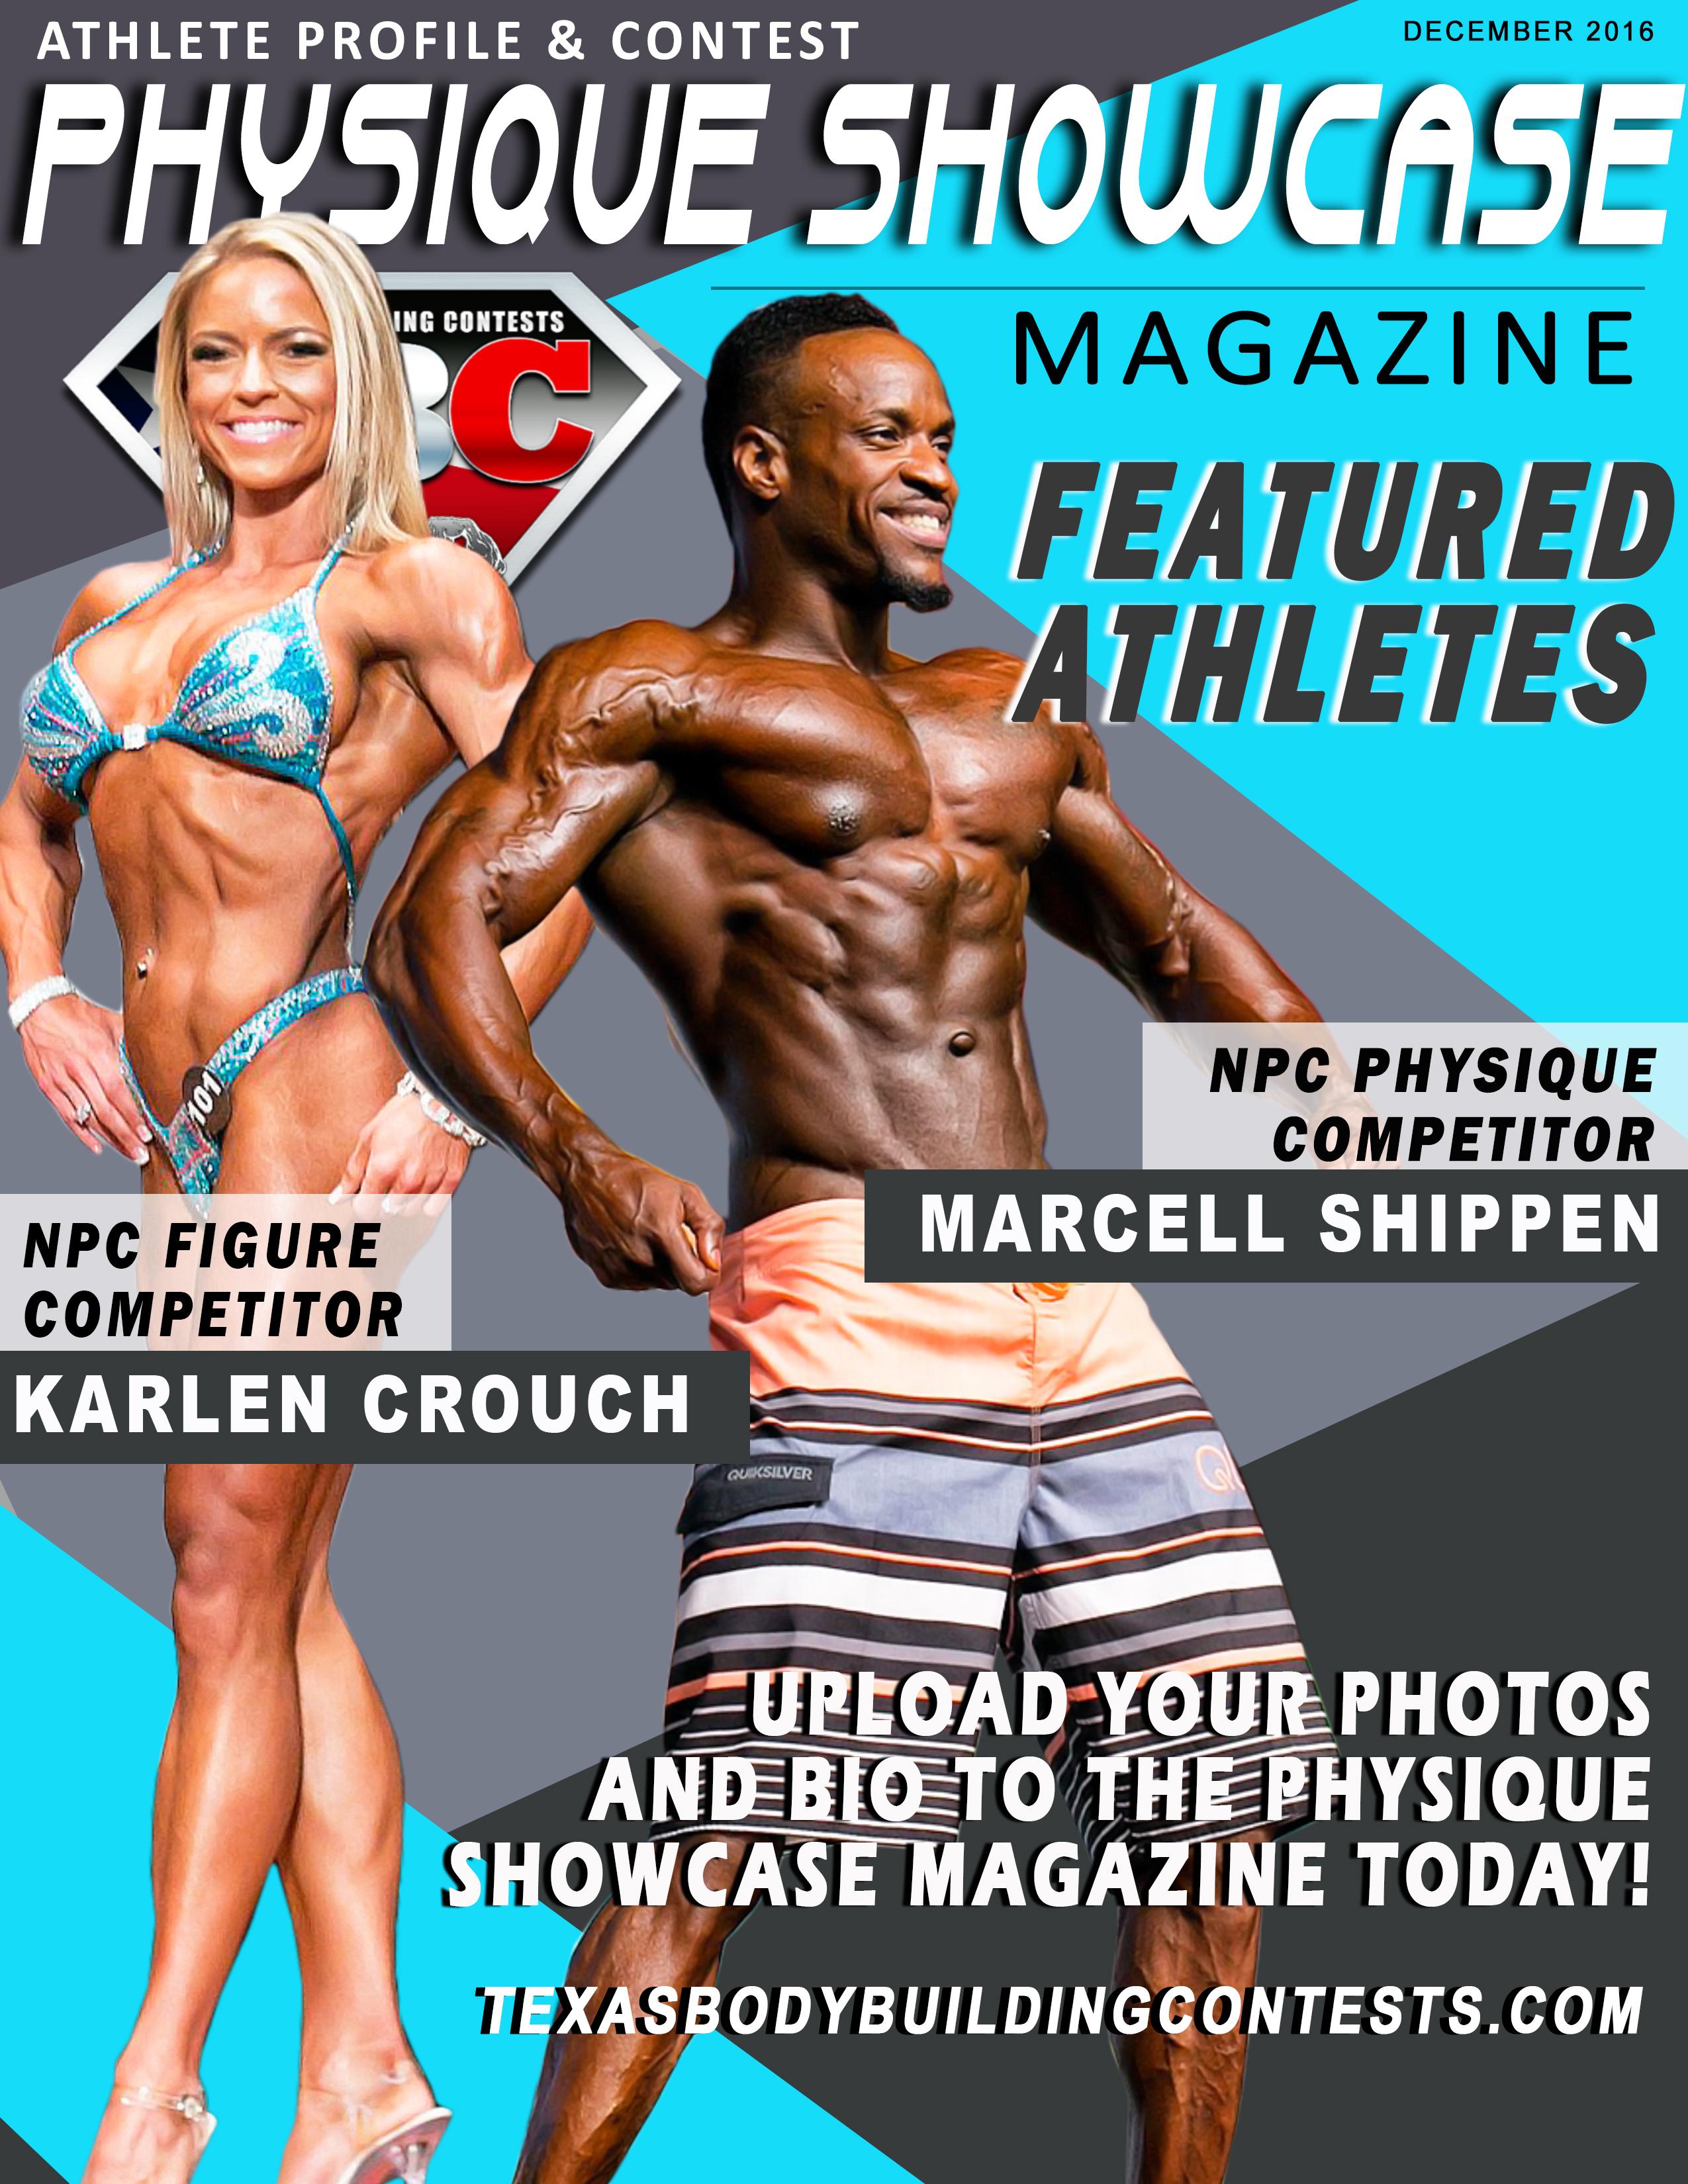 physique-showcase-magazine-cover-december